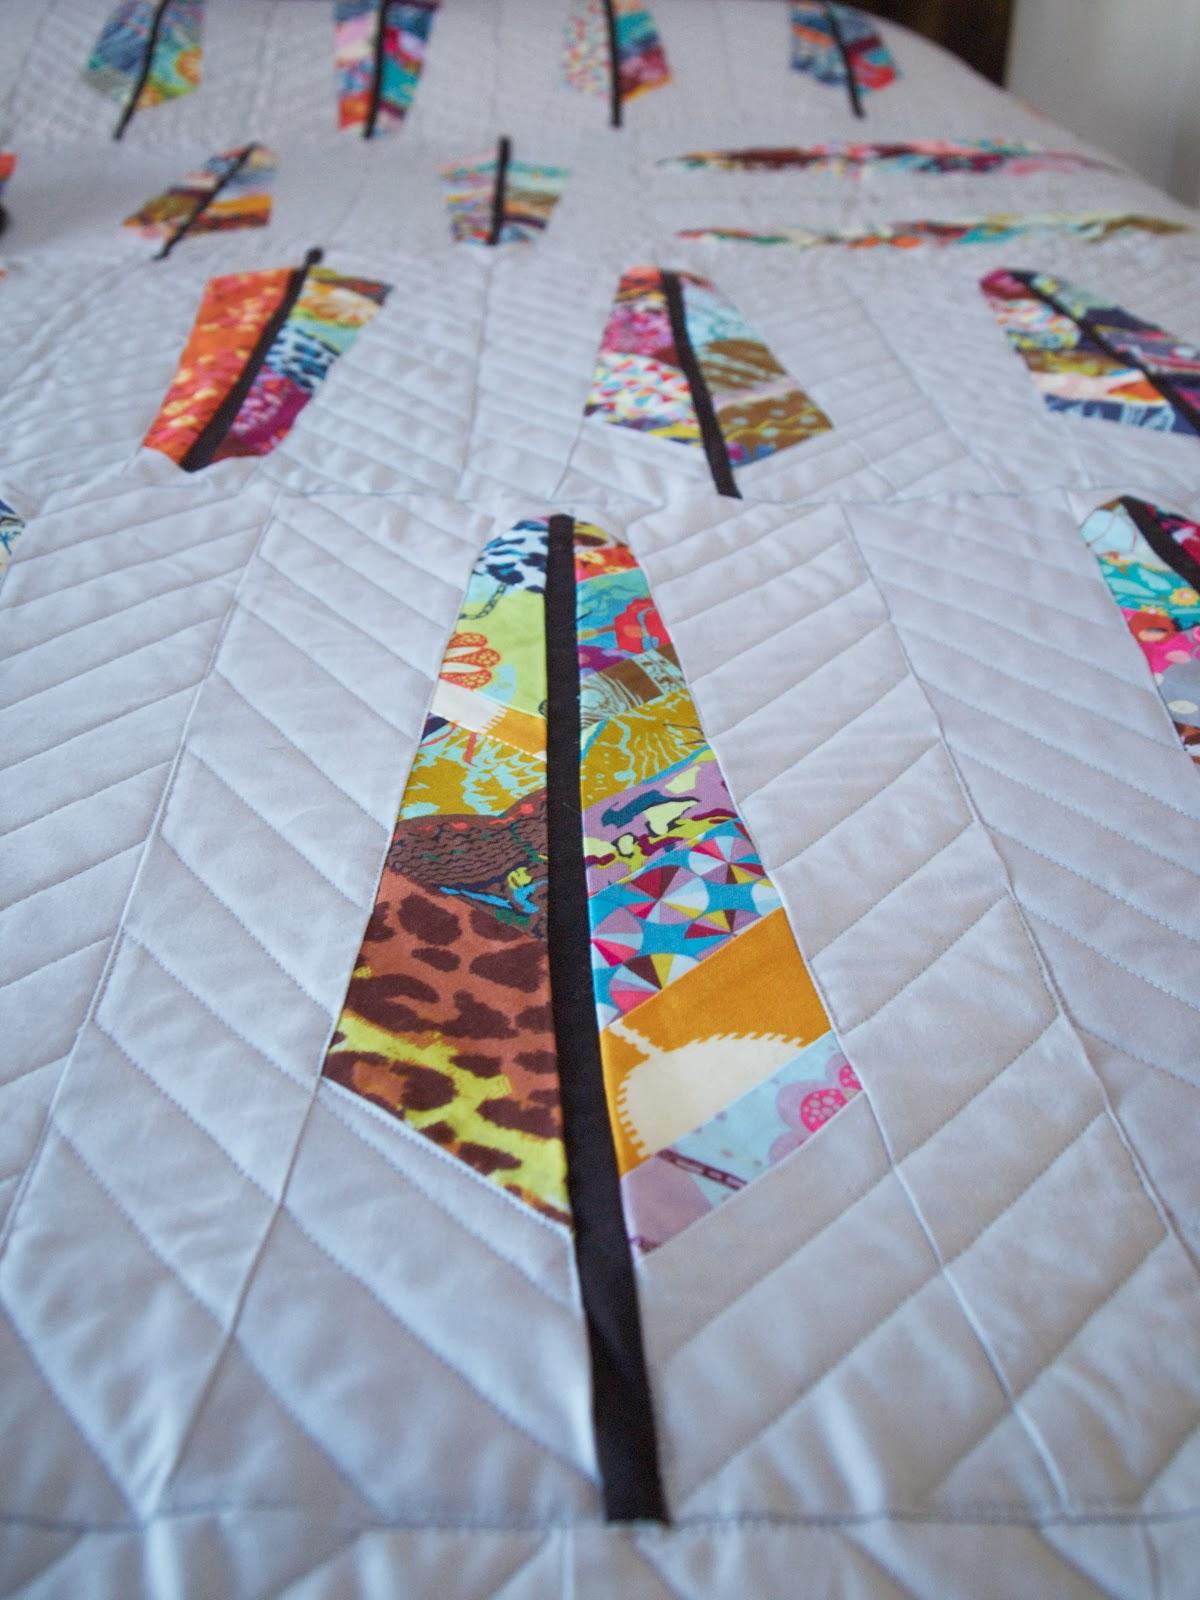 Fancy Tiger Crafts: Jaime's Feather Quilt : anna maria horner feather quilt - Adamdwight.com